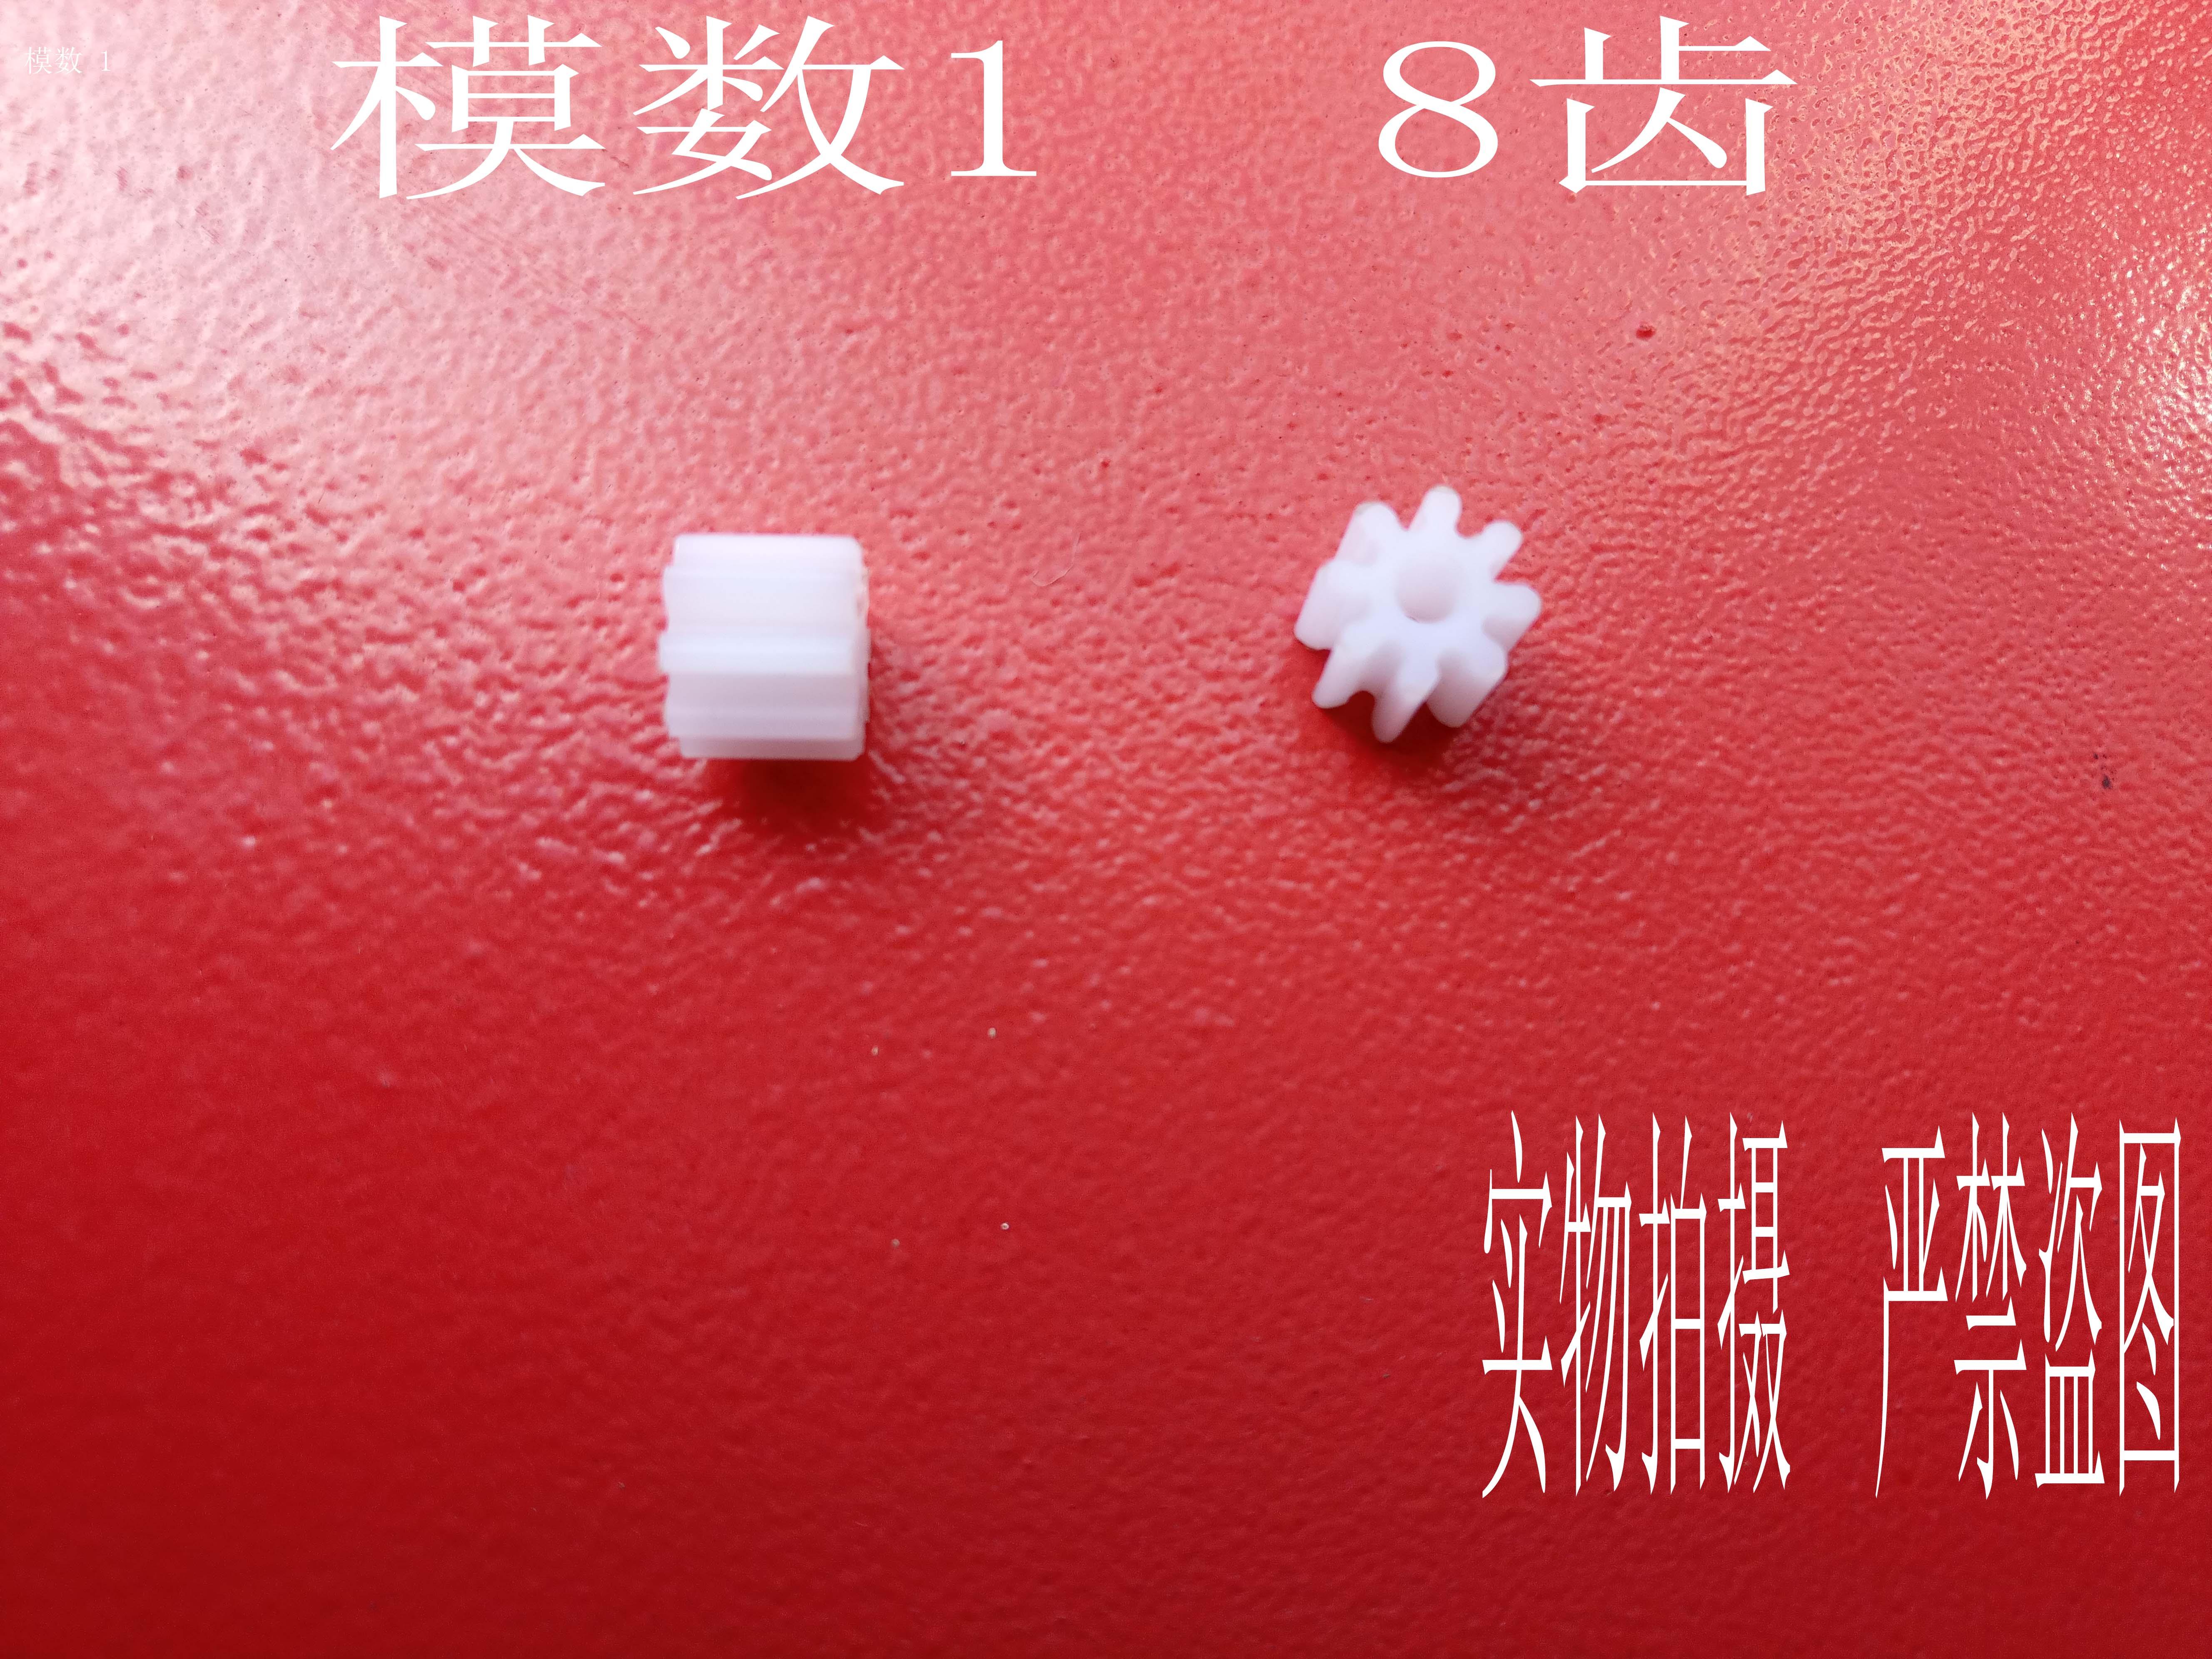 pom塑料尼龙玩具模型平面齿轮传动件加工 模数1 齿数8  外径10